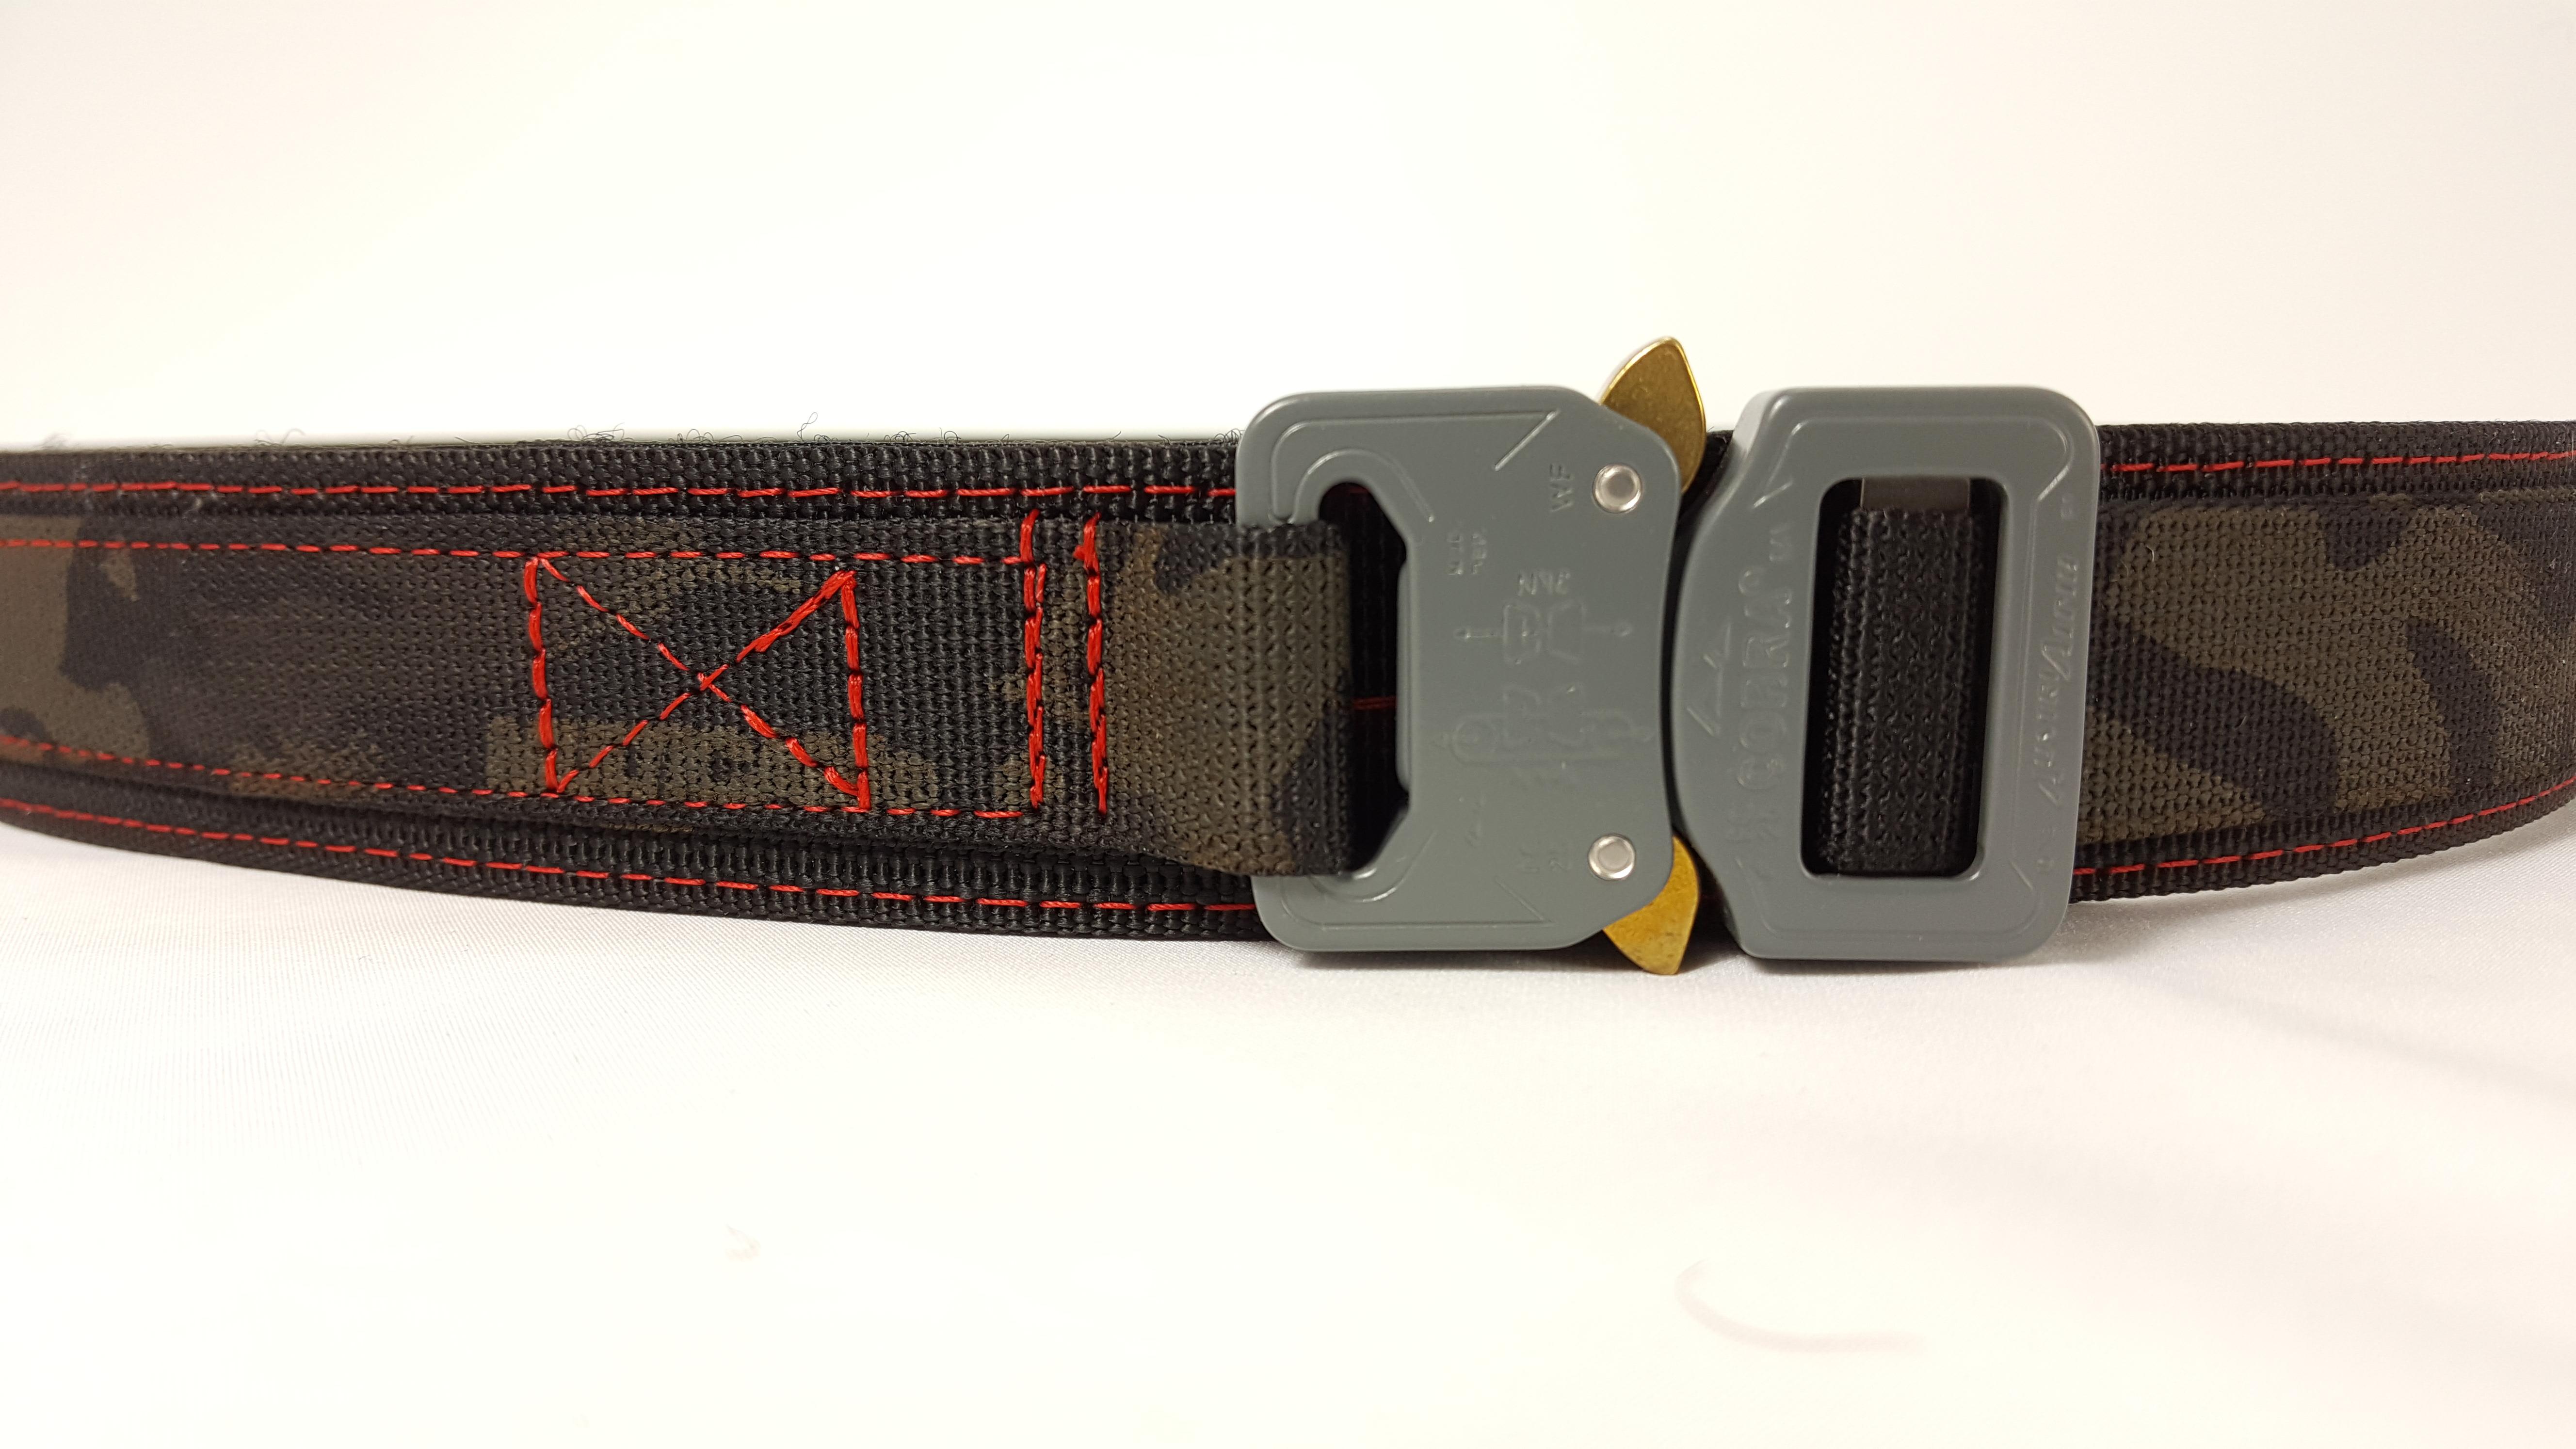 edc cobra belt